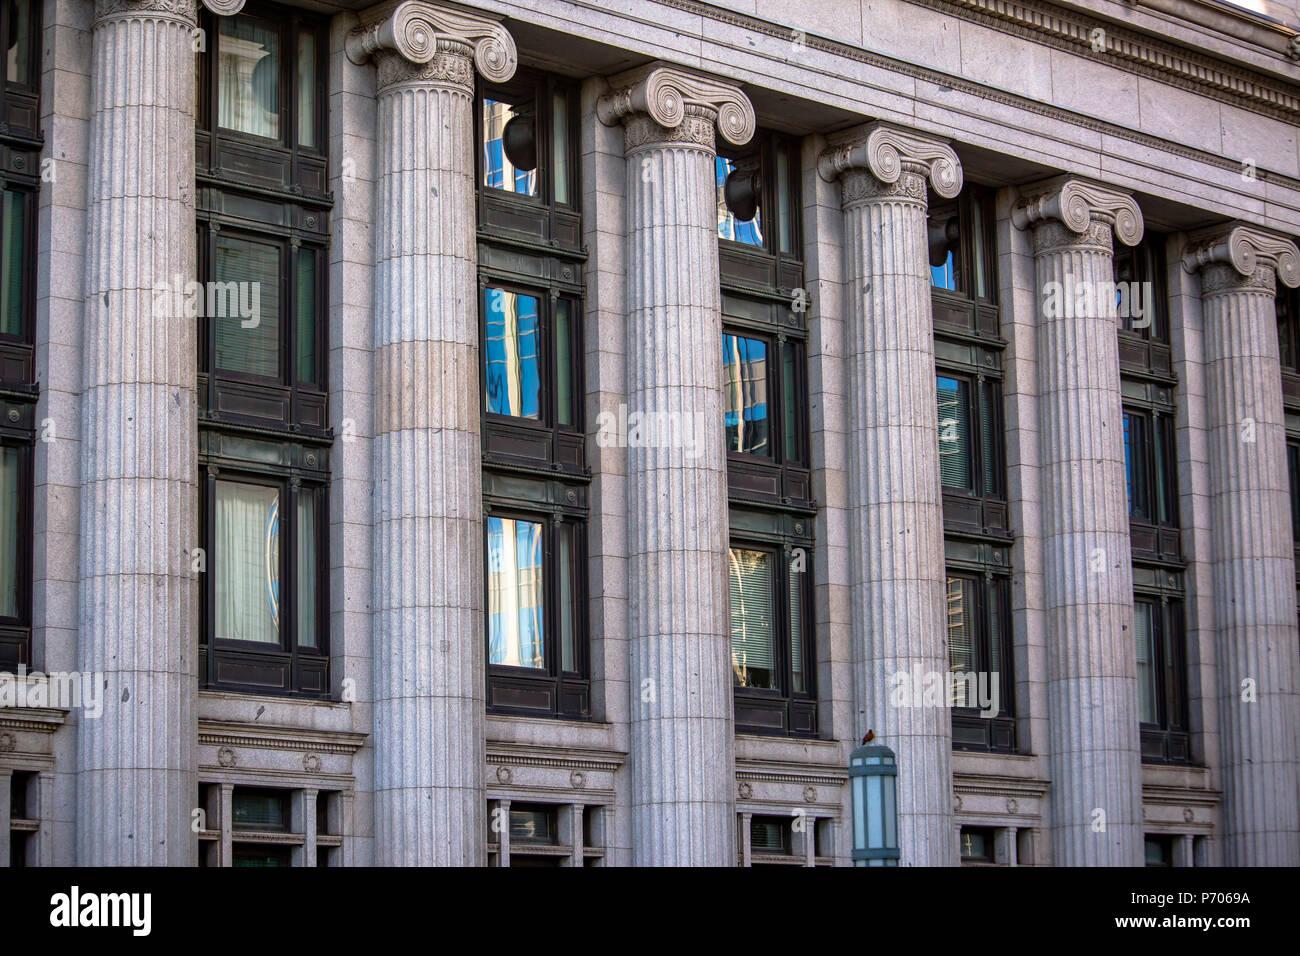 Stone columns seen on stoic building - Stock Image